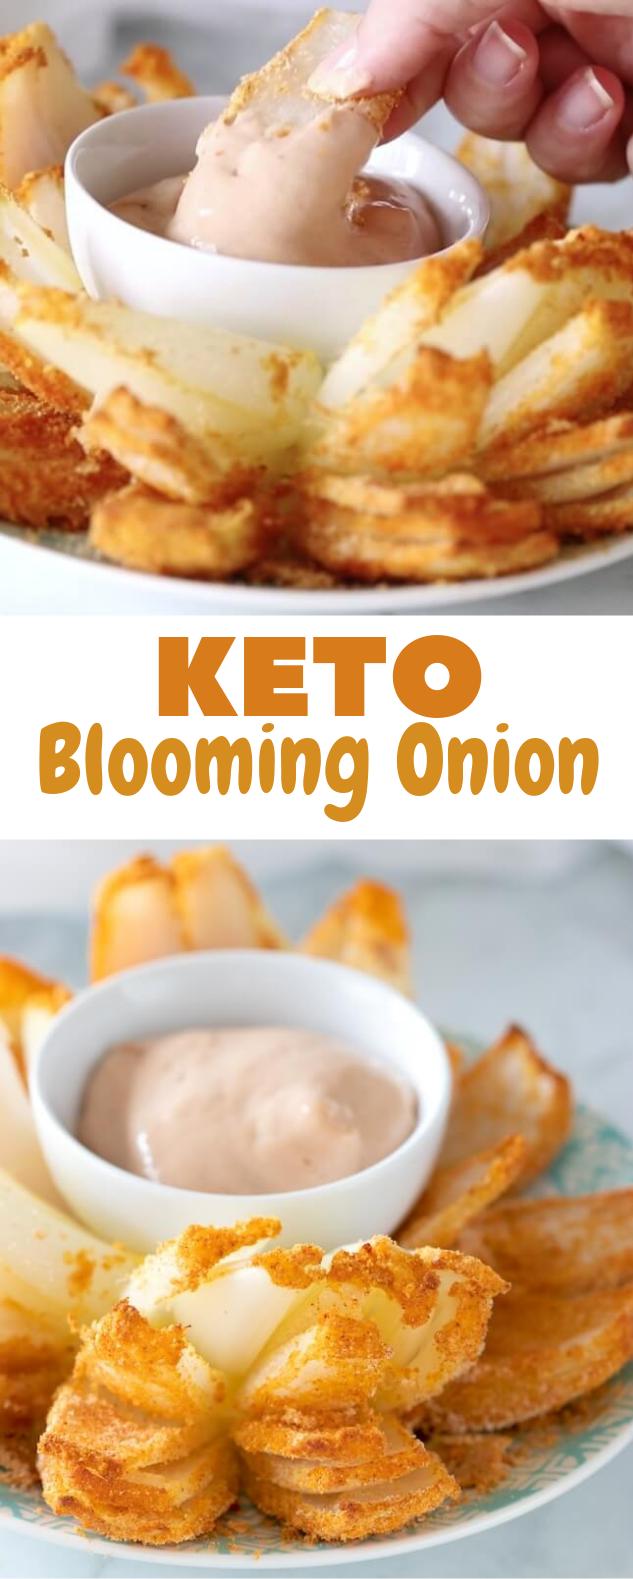 Keto Blooming Onion